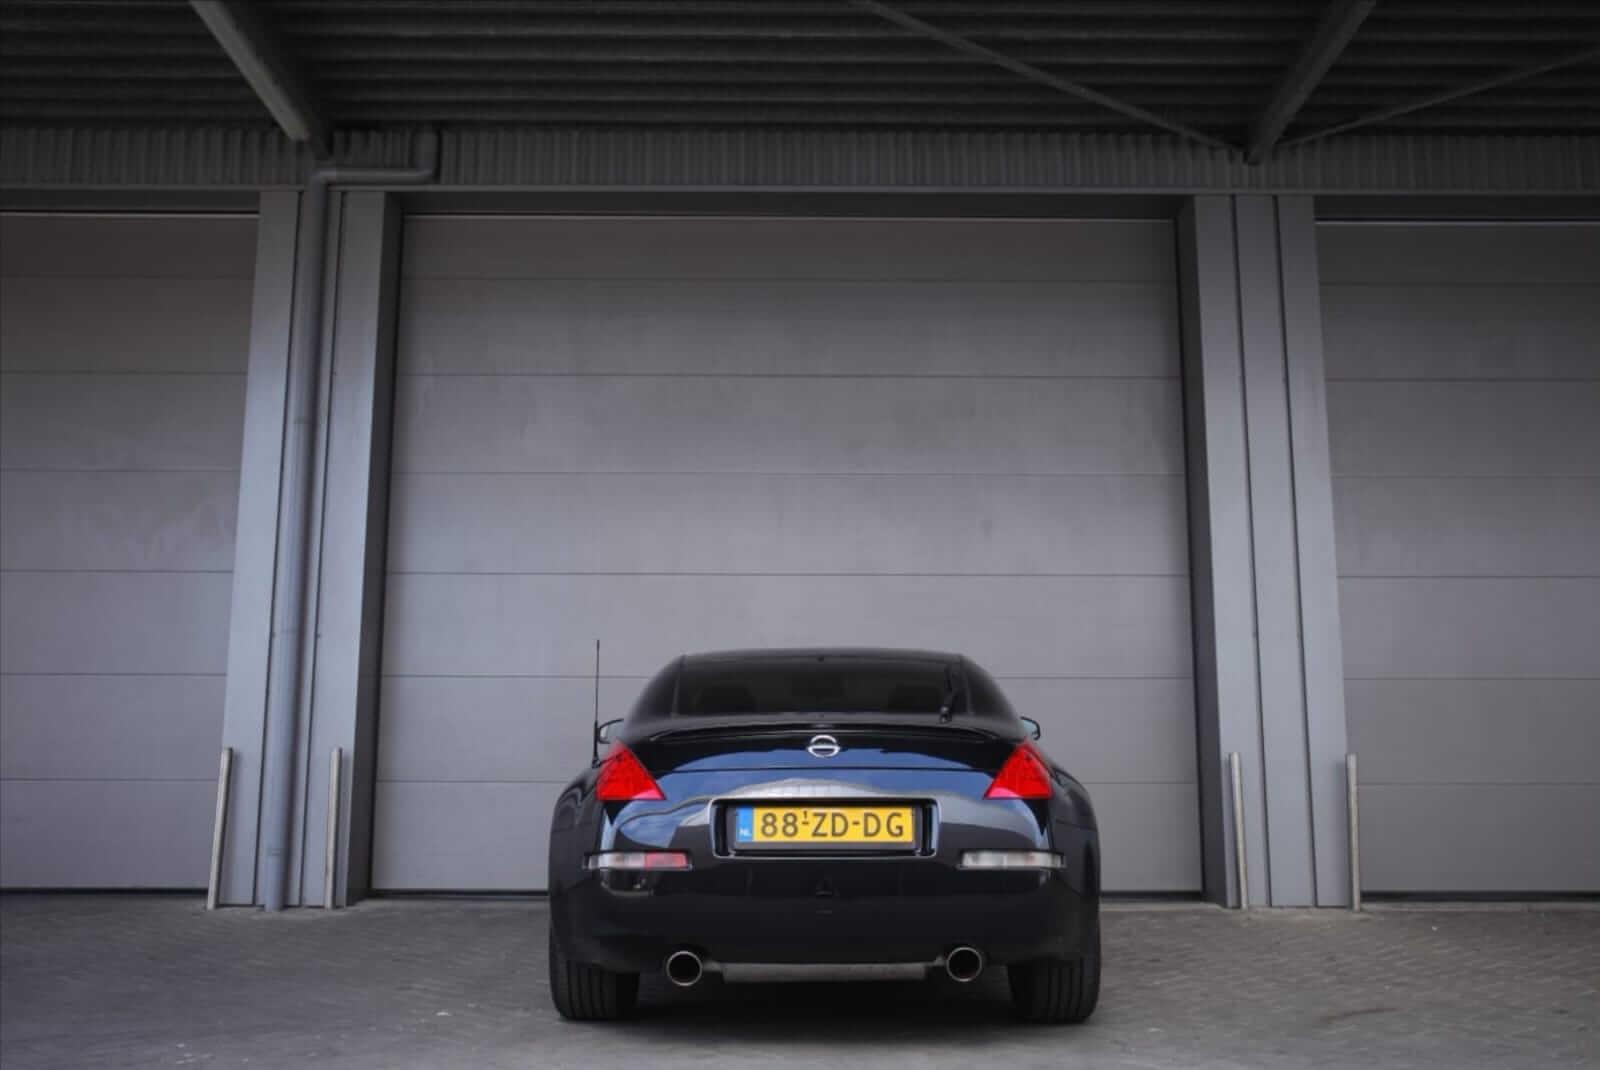 Nissan 350Z HR Track Edition 2008 back – by Next Level Automotive – Go to nextlevelautomotive.eu